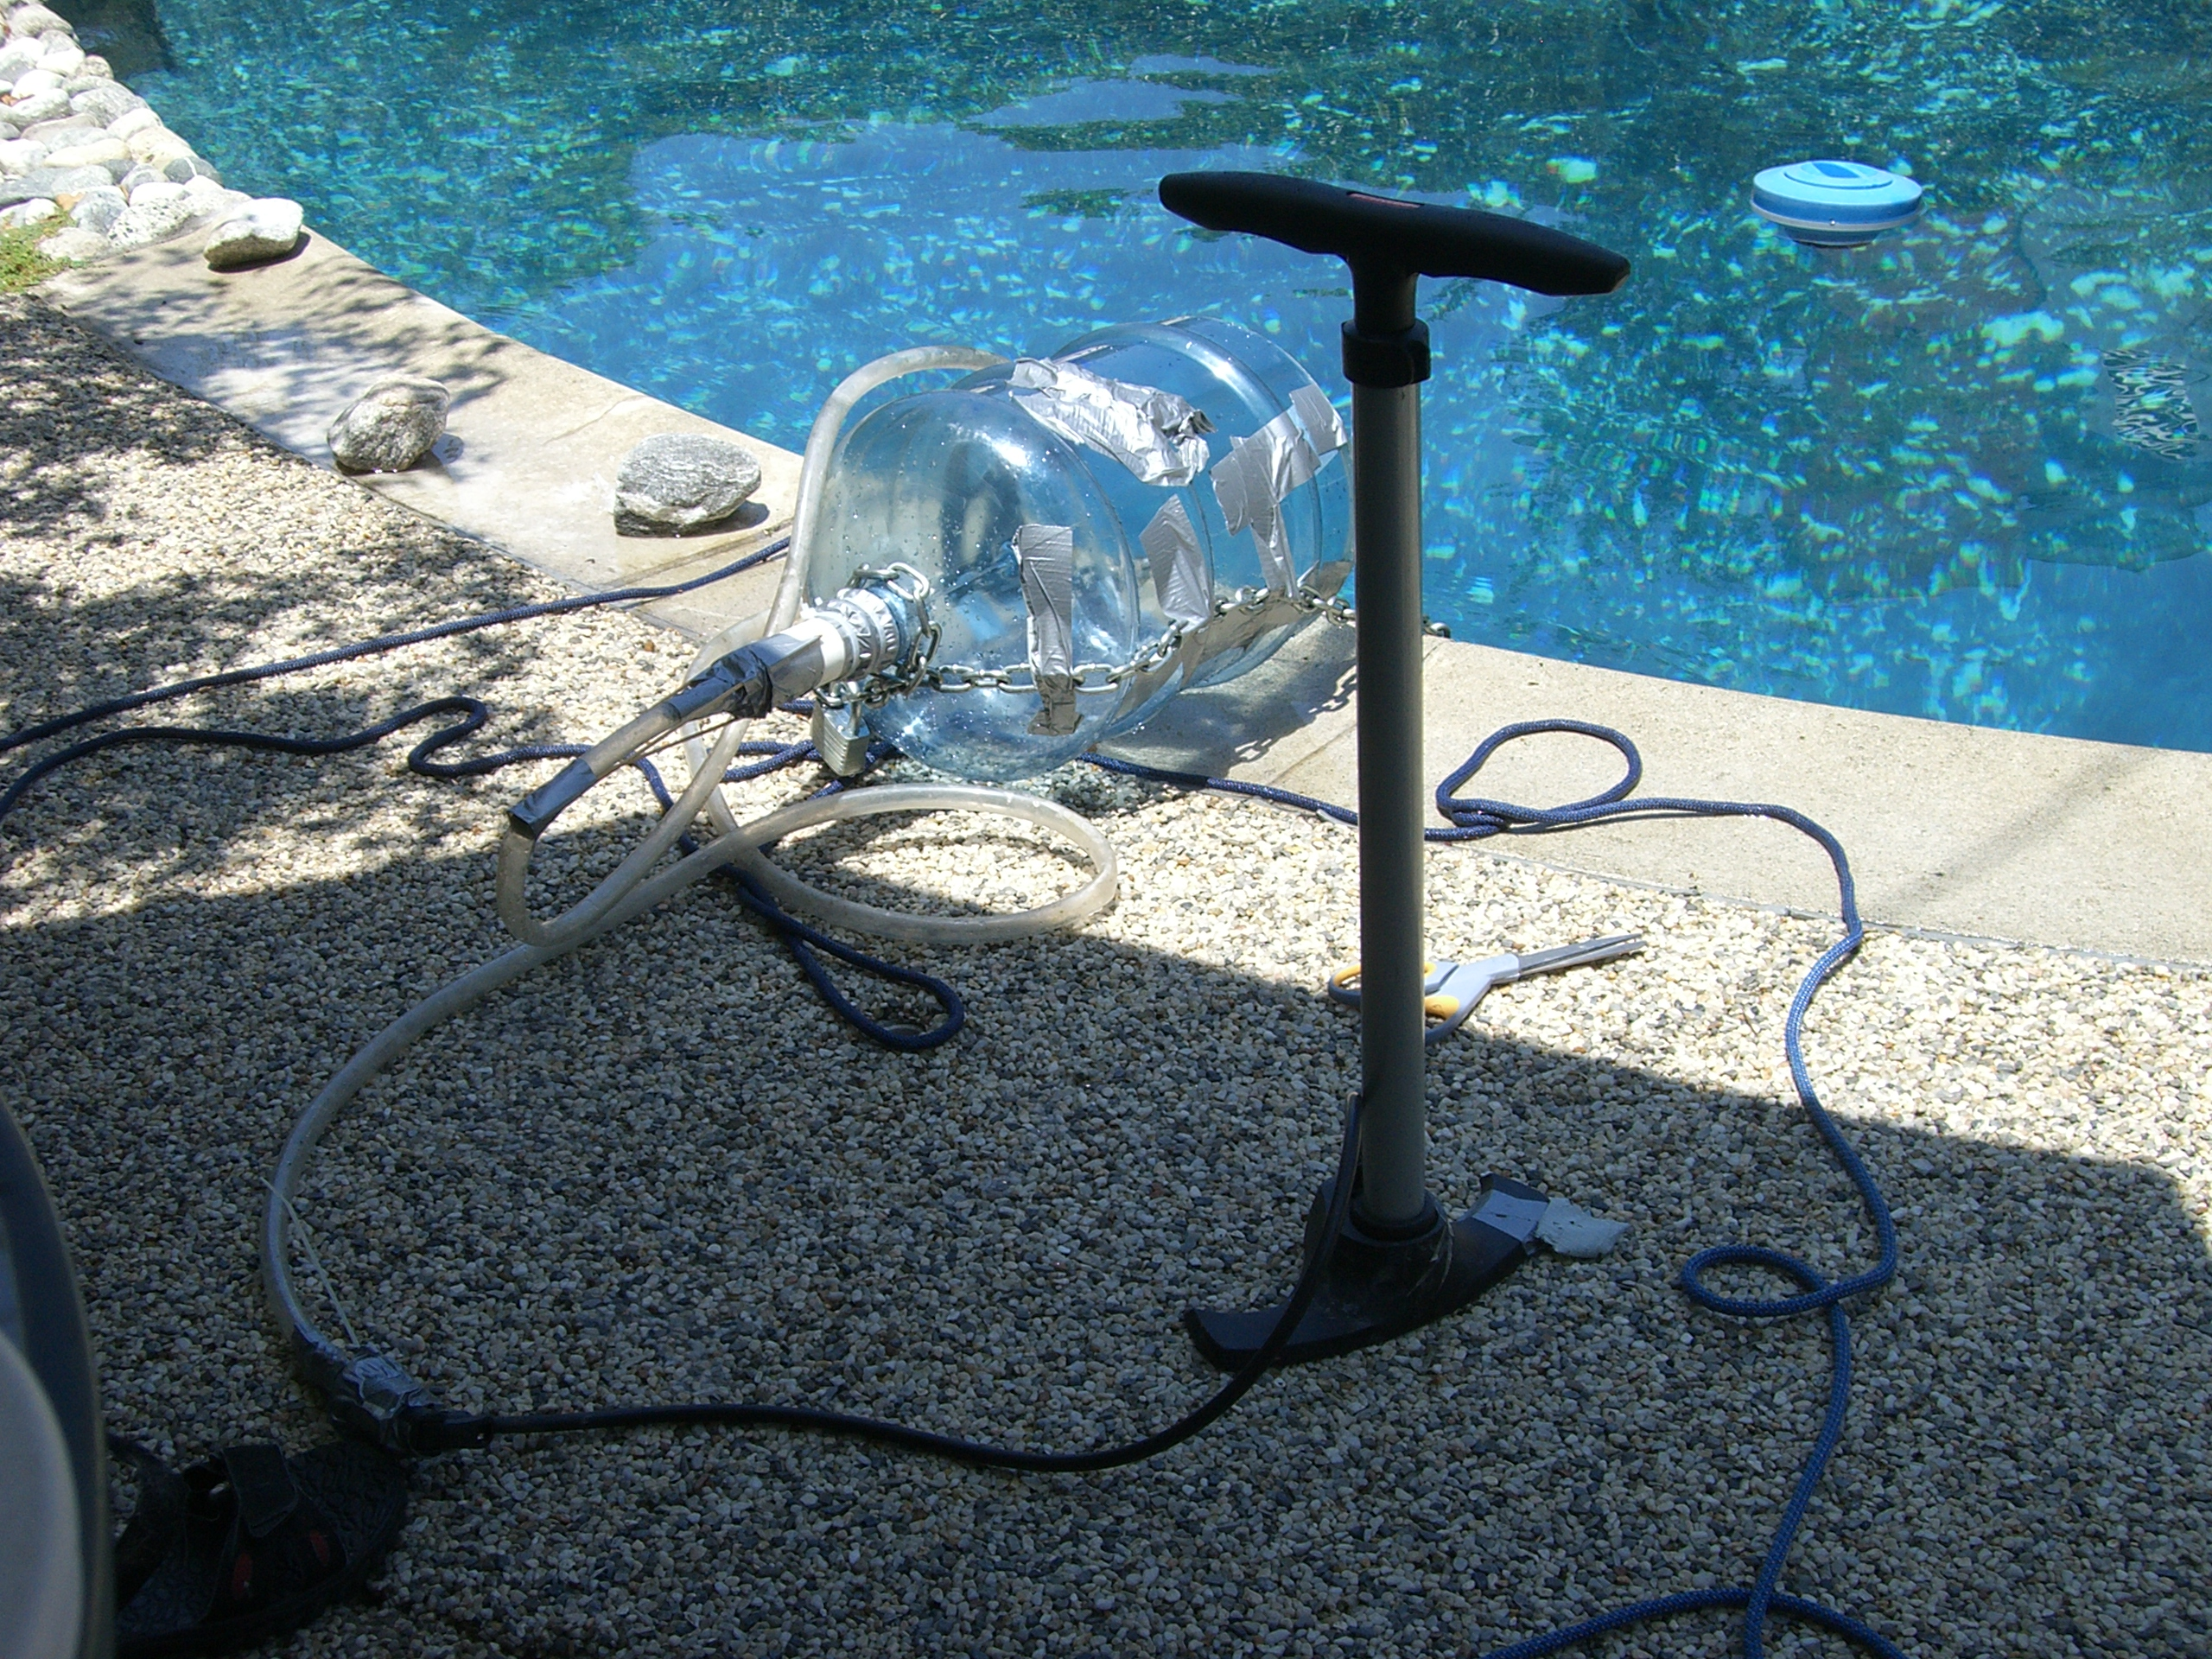 Homemade Diving Apparatus